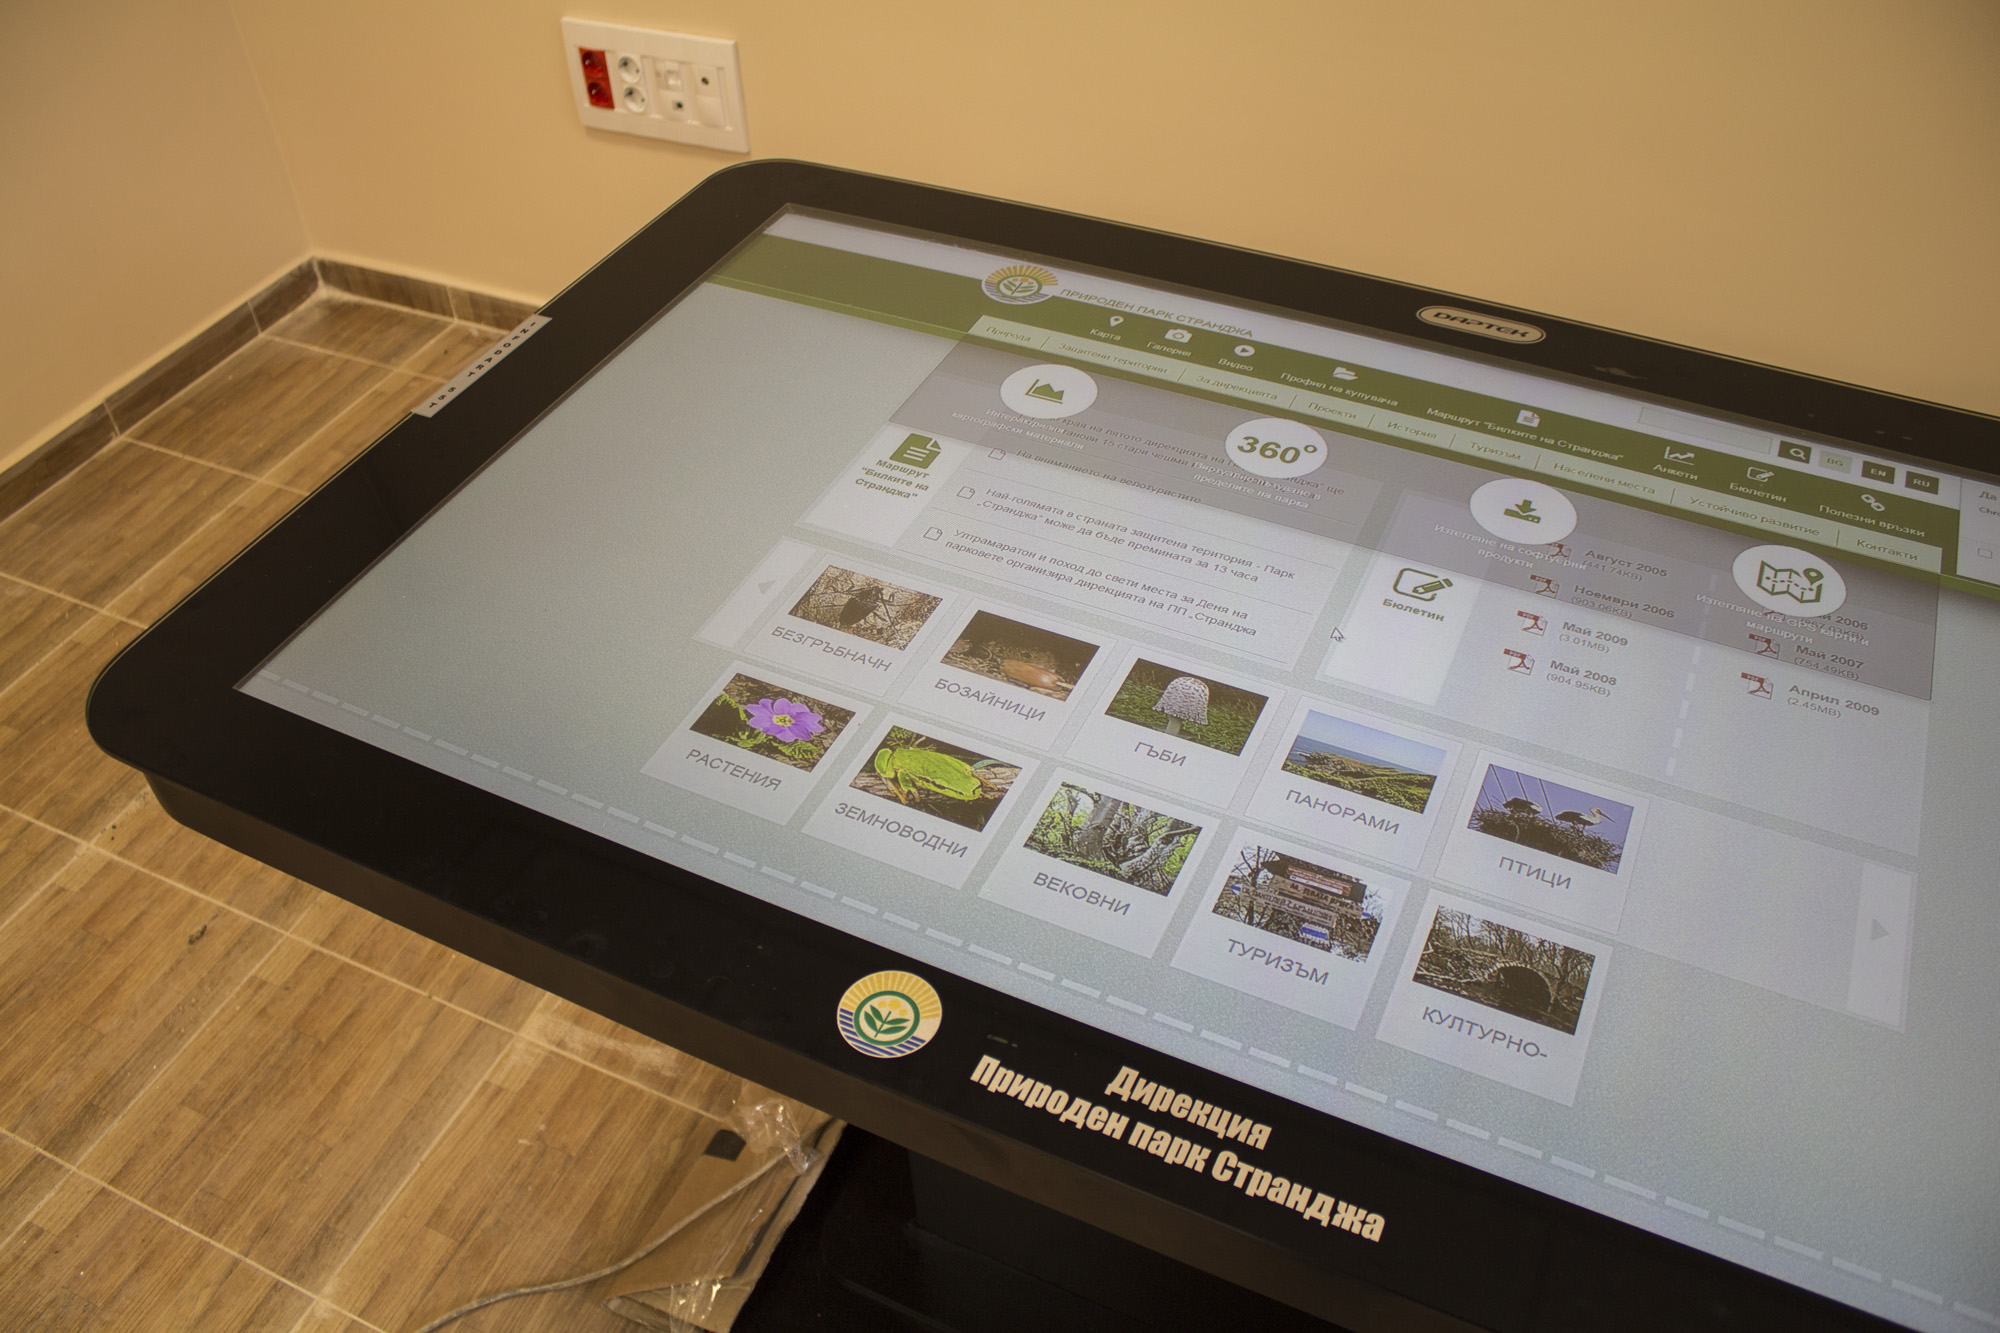 Природен Парк 'Странджа' - интерактивна маса и информационен киоск